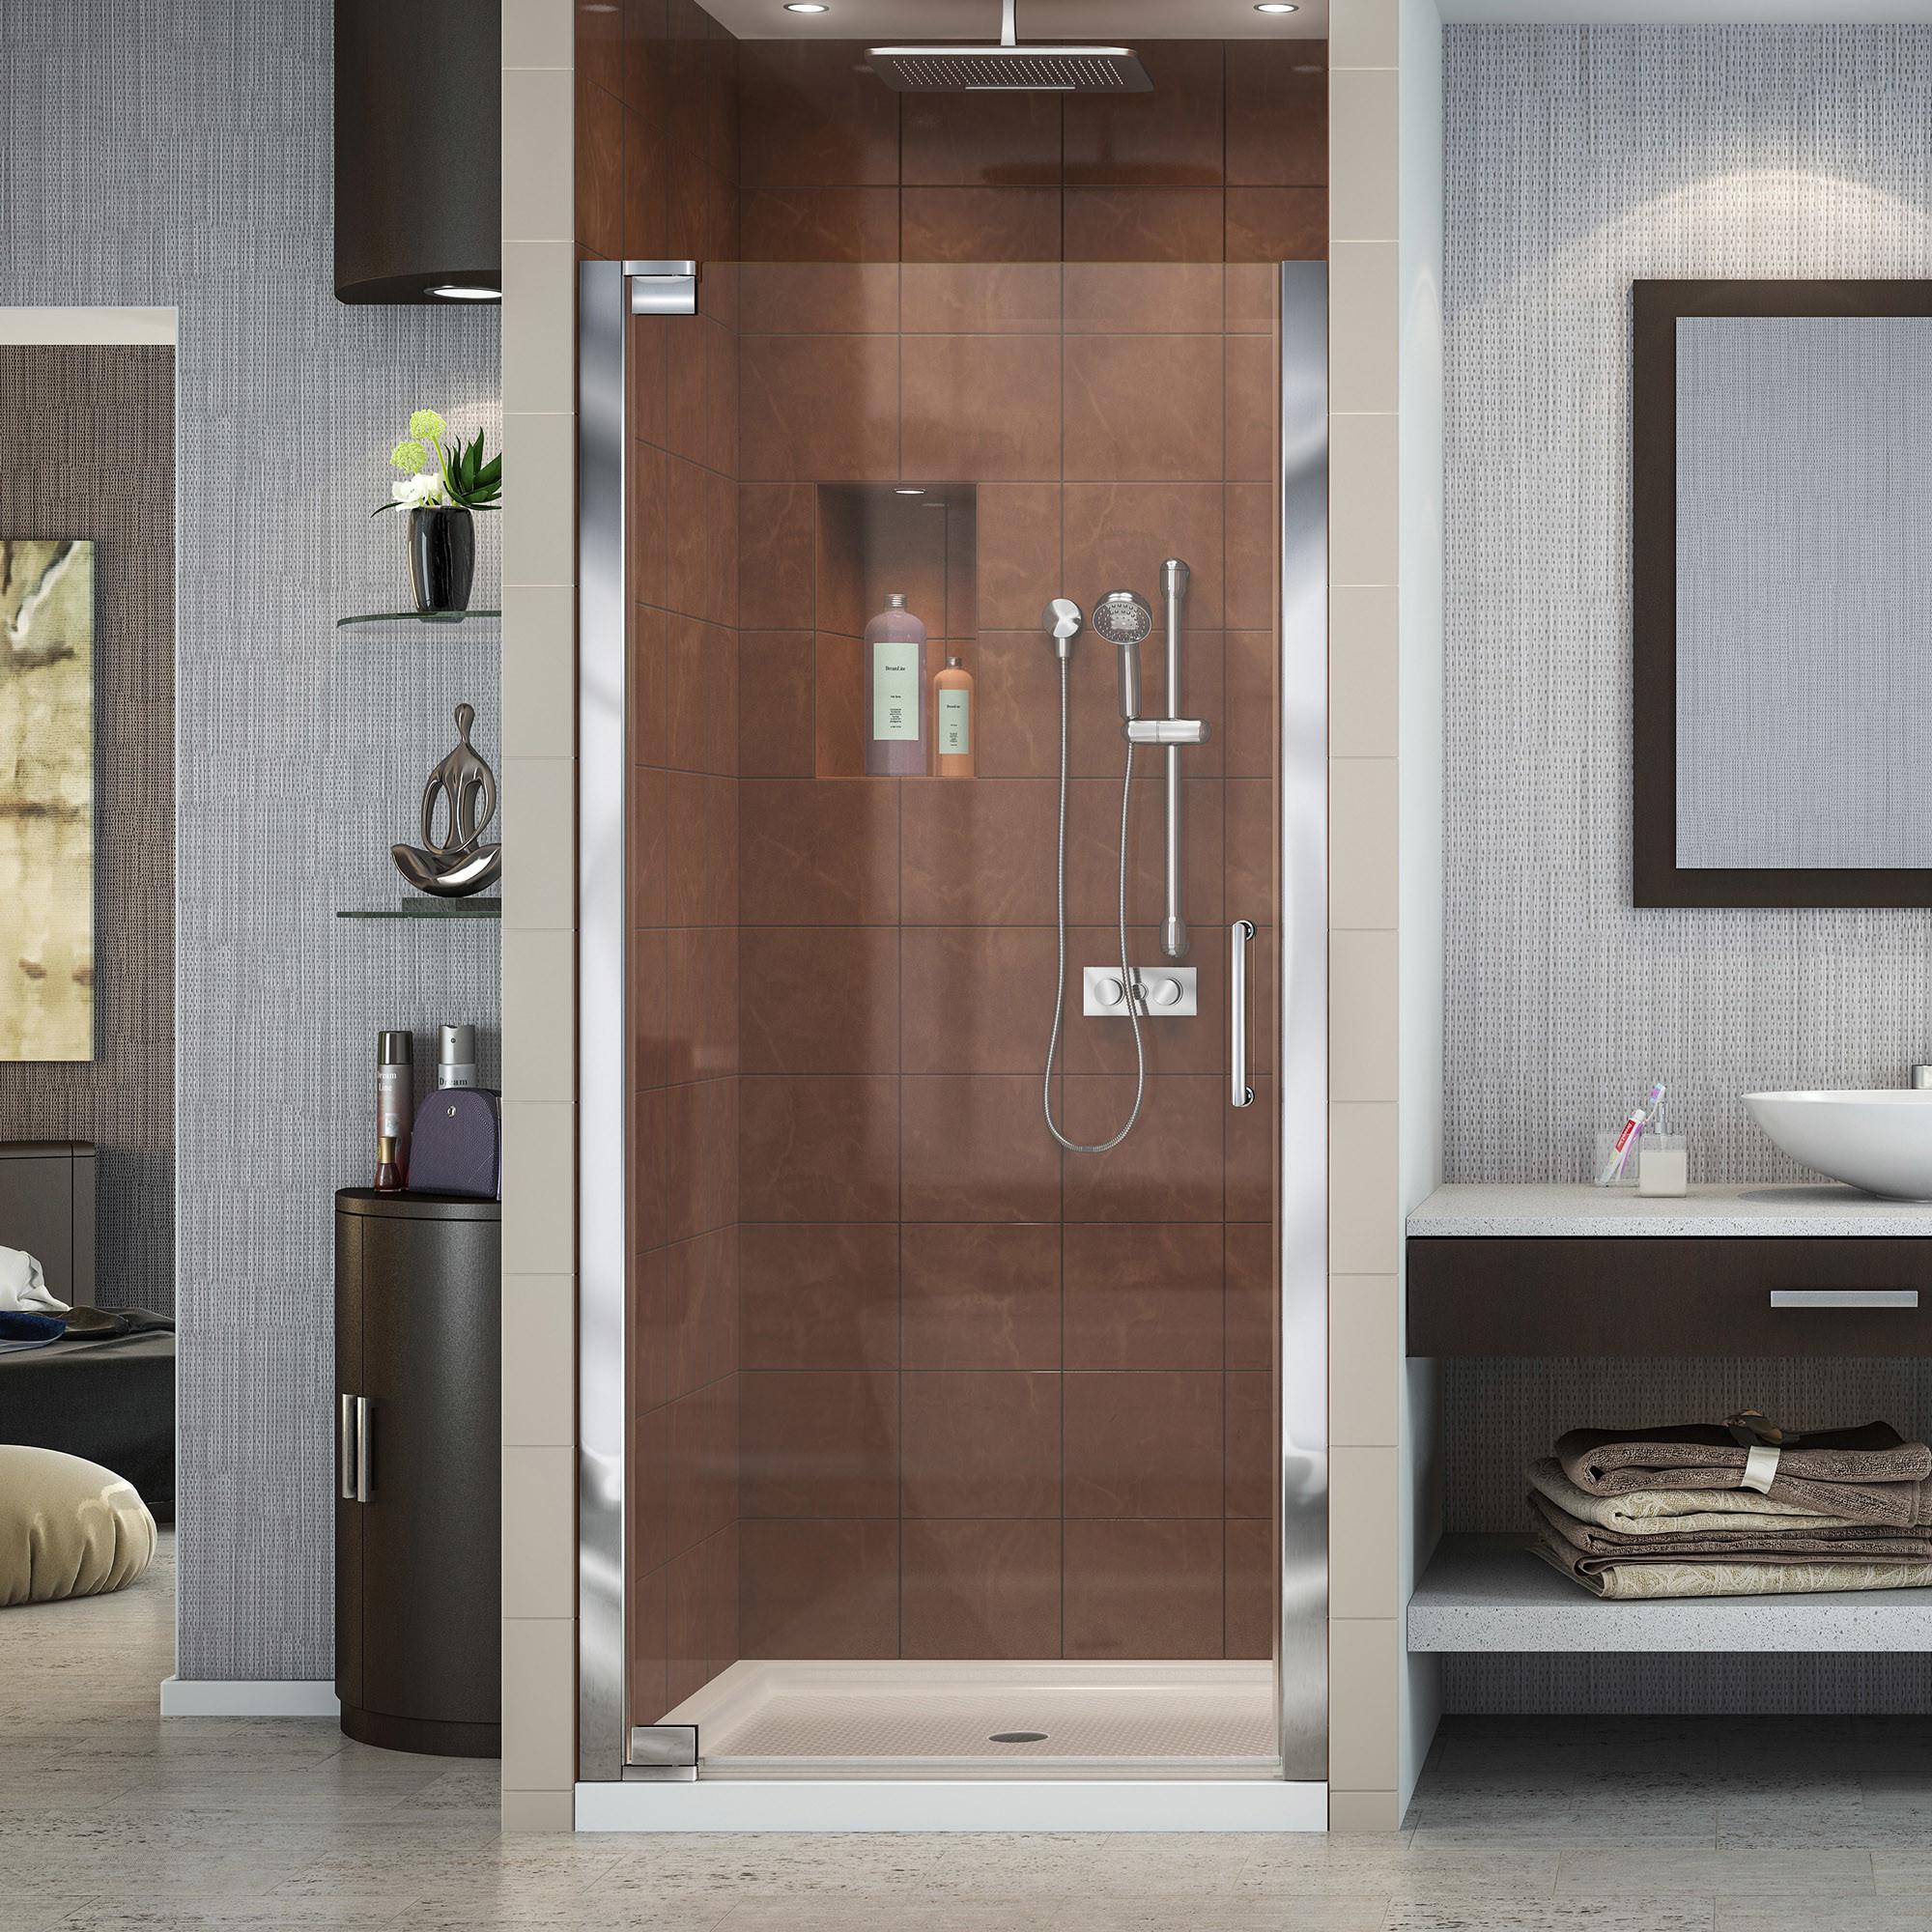 Details About Dreamline Shdr 4127720 Elegance 72 H X 29 W Pivot Frameless Shower Door Chrome